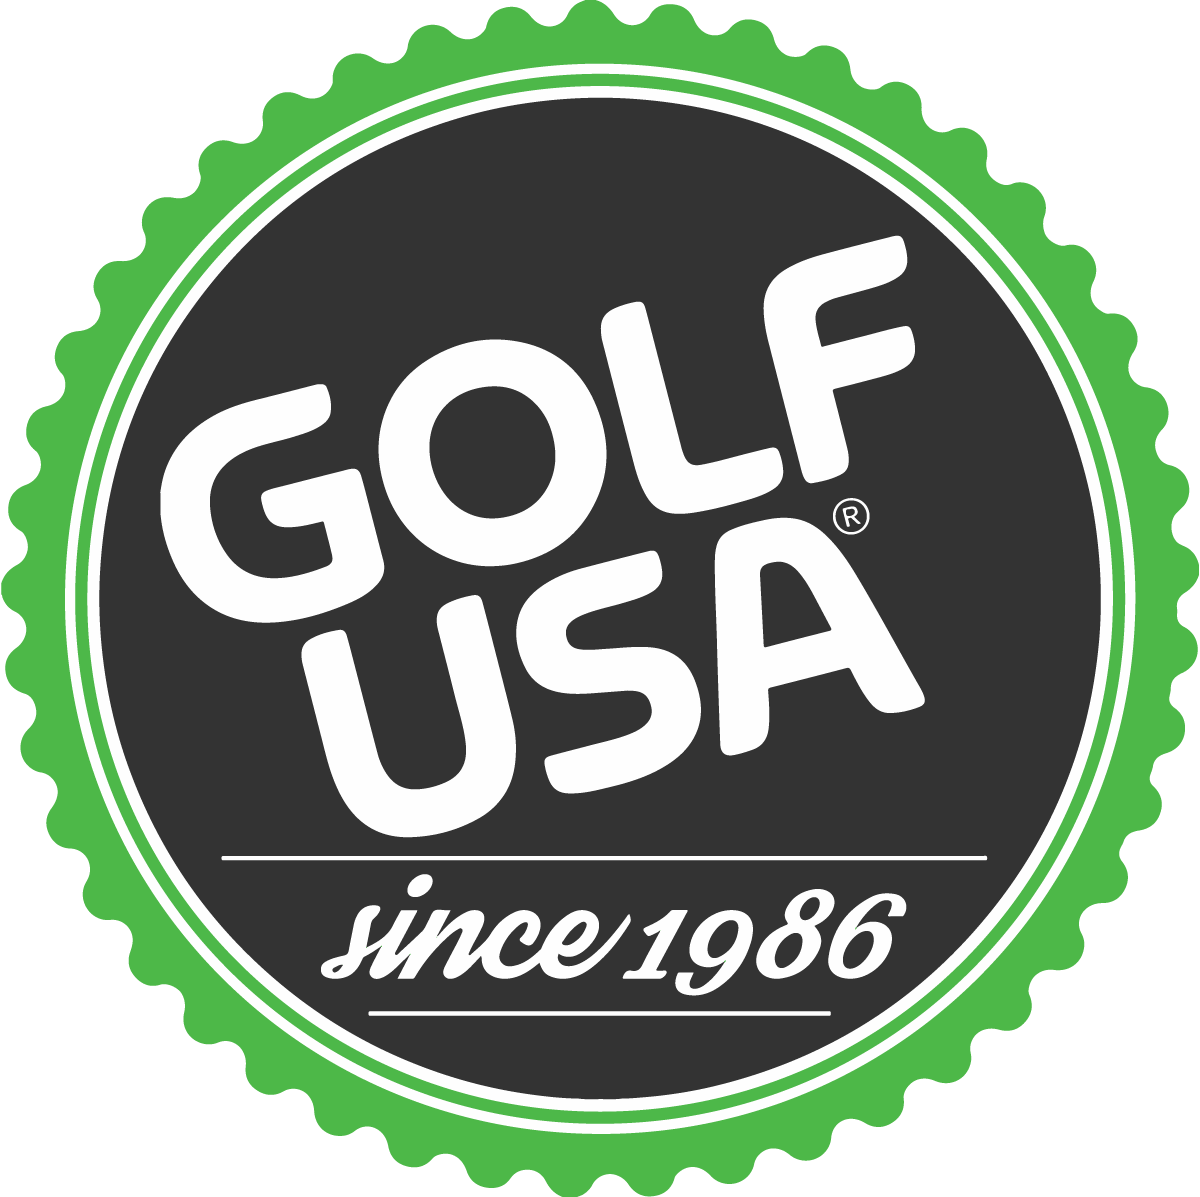 Golf USA logo